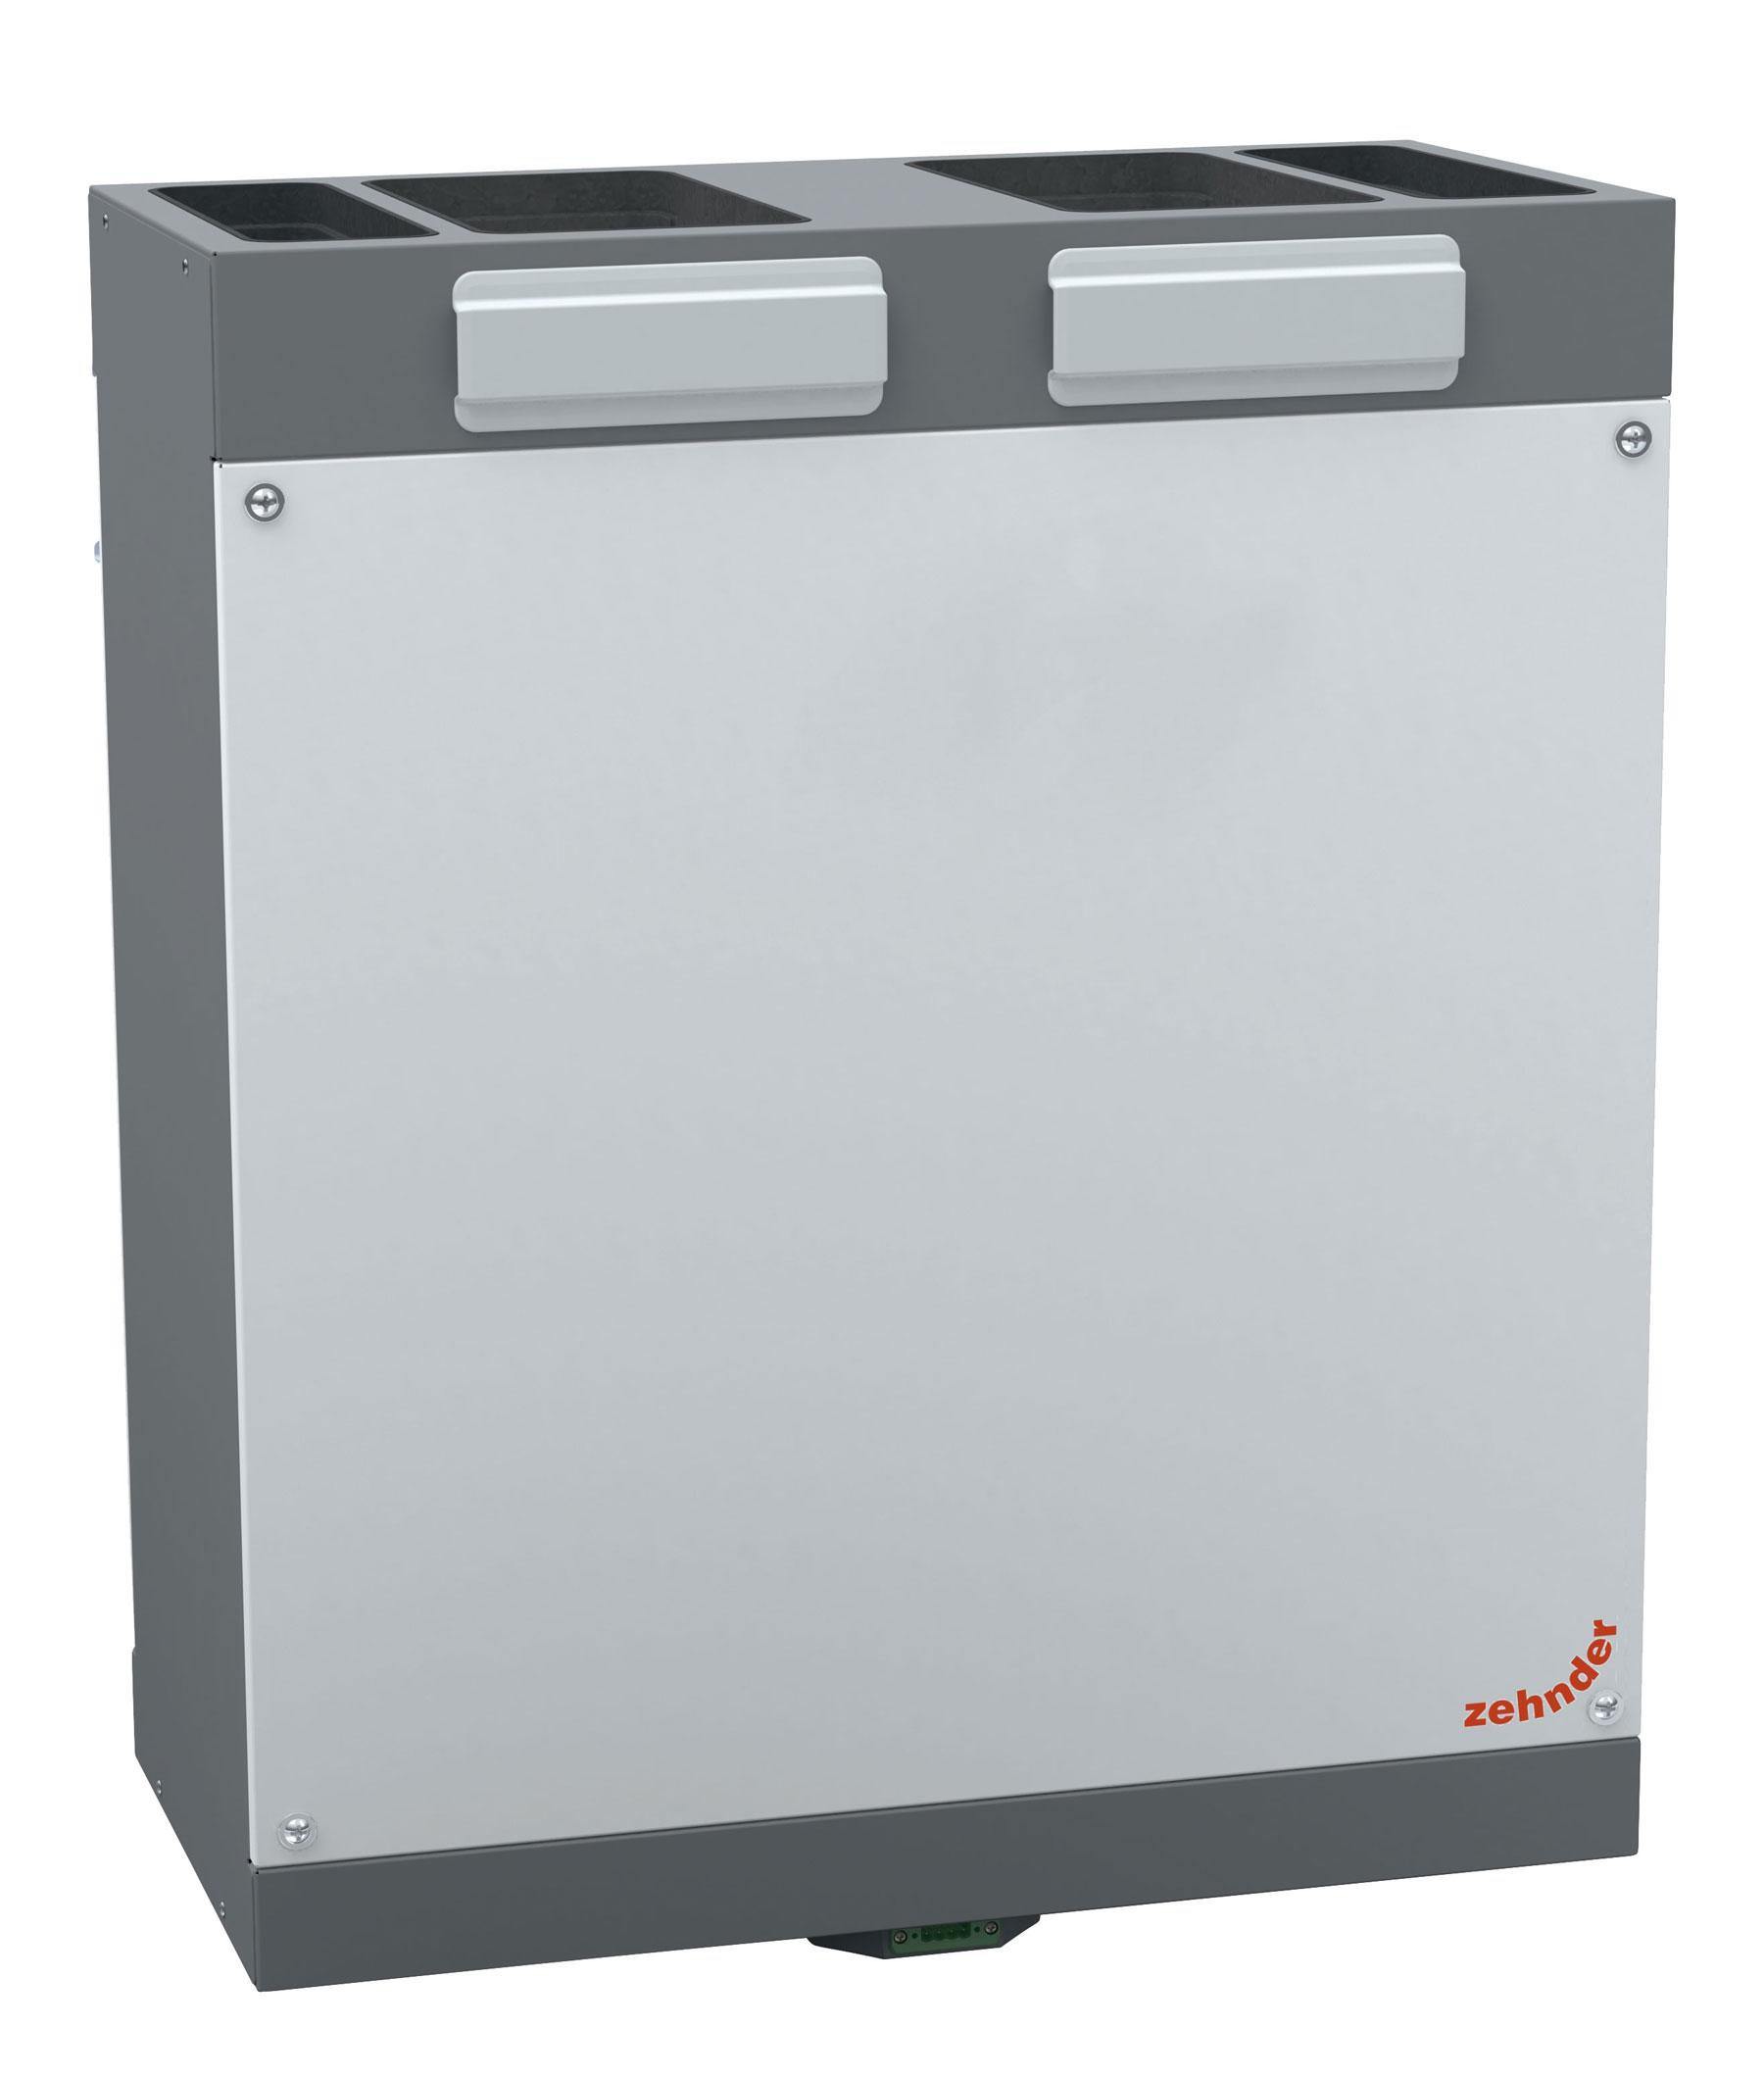 05Prehlad Zehnder Kompakt Kuchyne CA180 Print